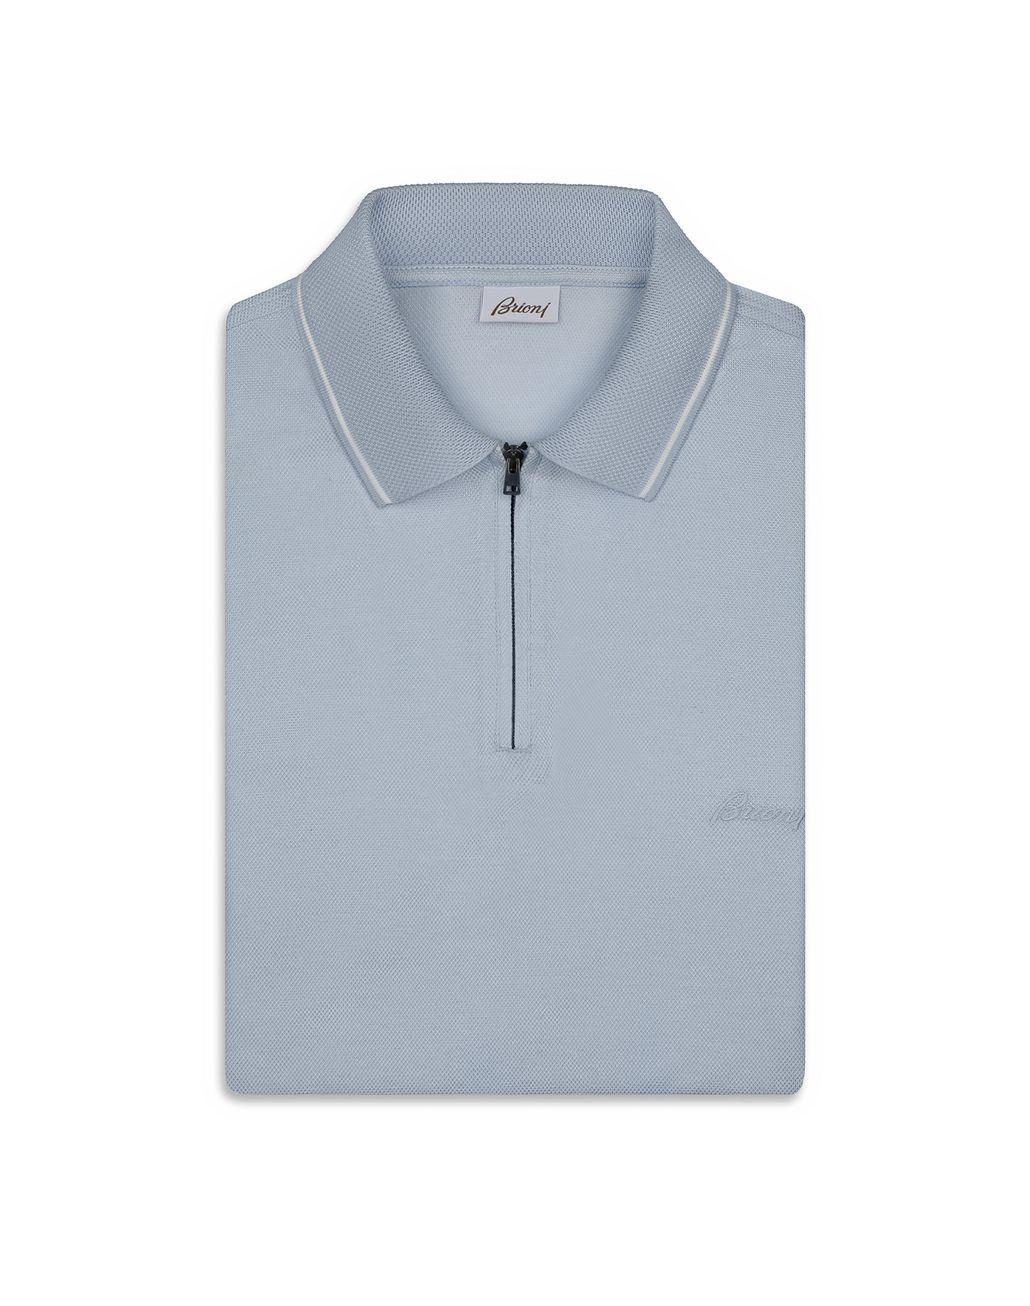 BRIONI Light Blue Piquet Polo Shirt T-Shirts & Polos Man e